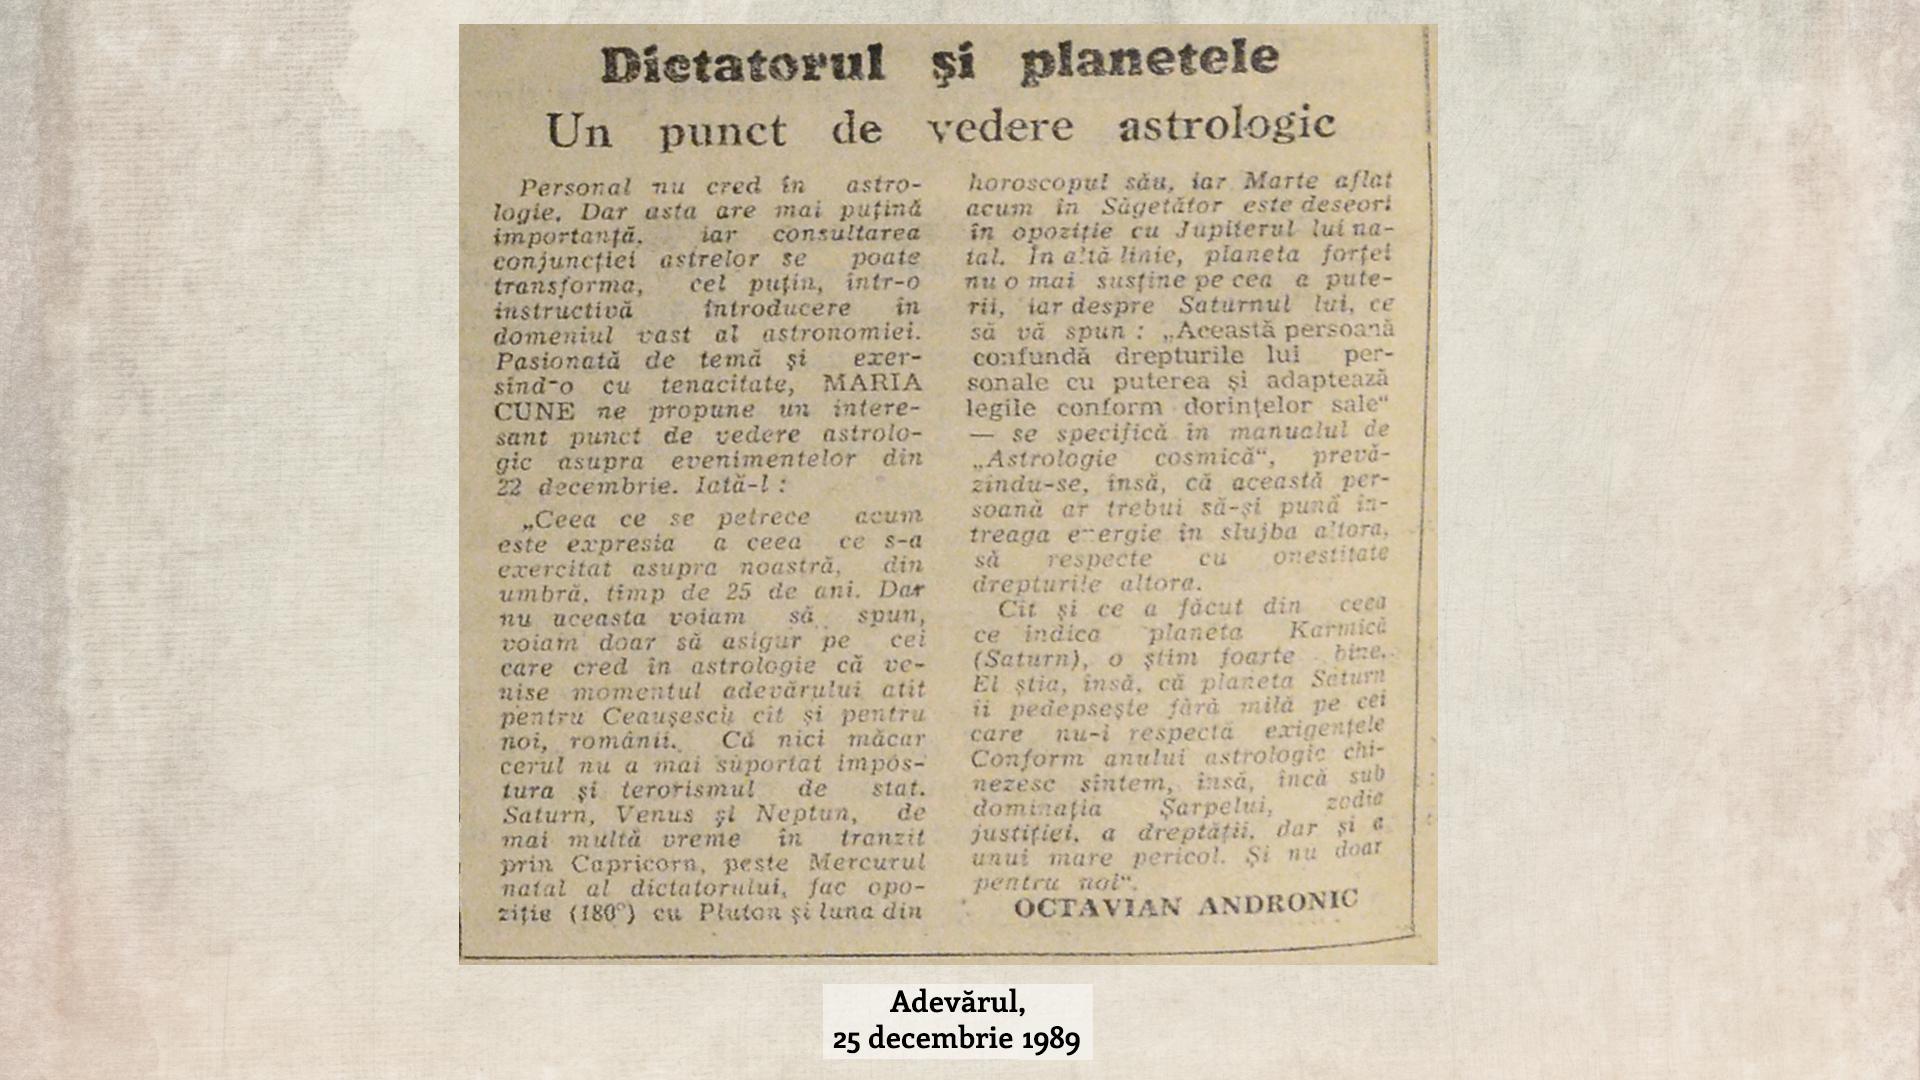 11-Dictatorul si planetele